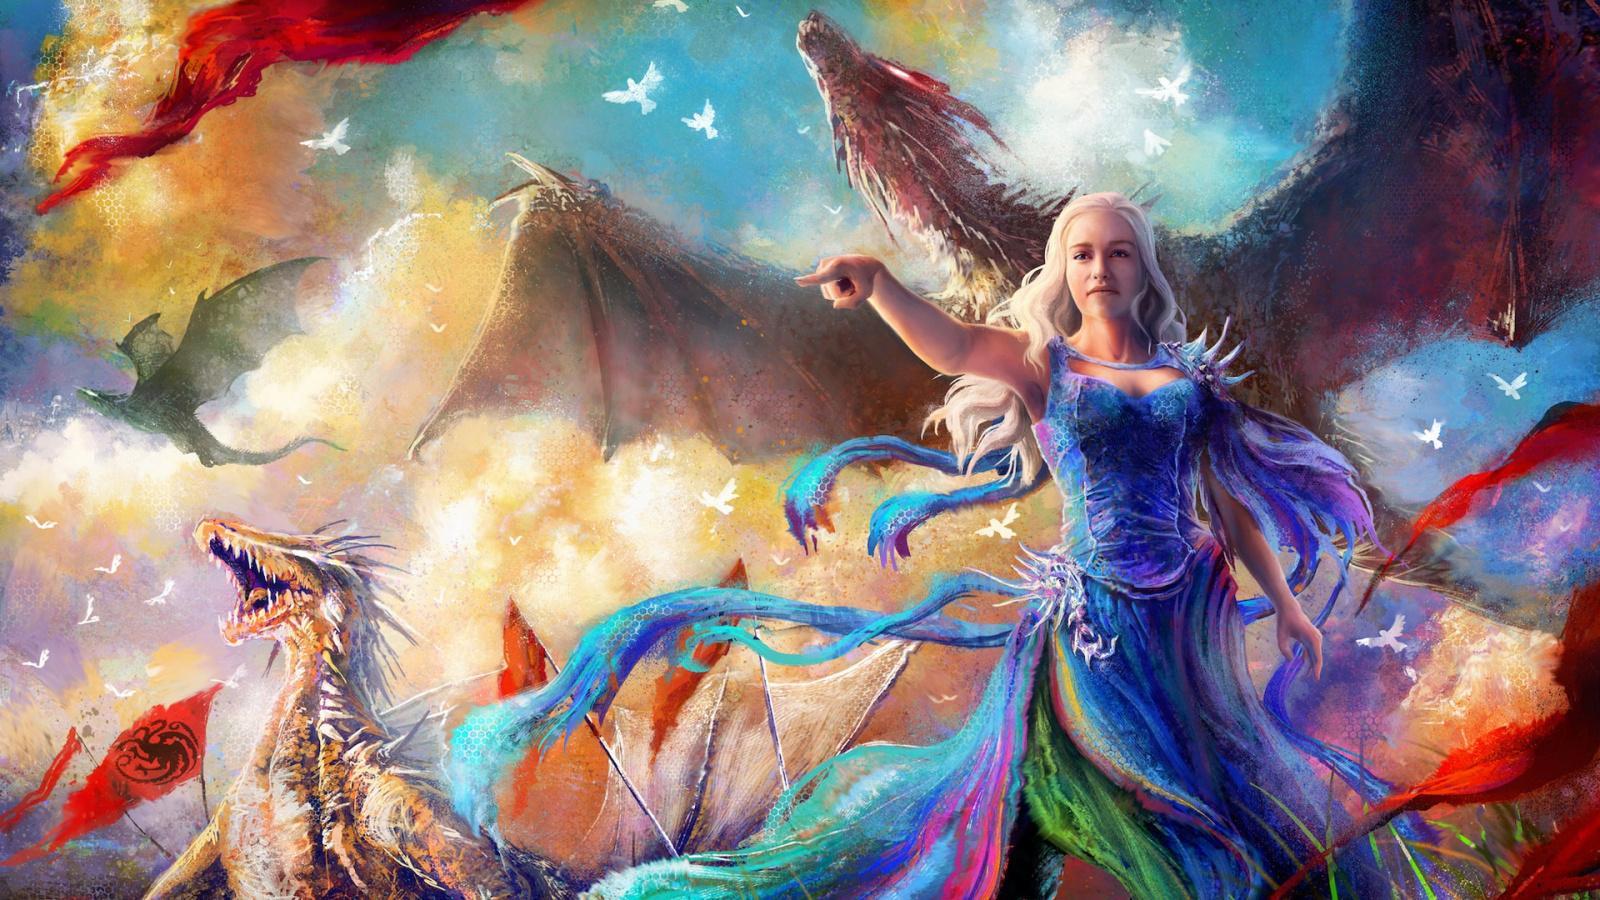 Download Wallpaper - Daenerys Targaryen Wallpaper Anime , HD Wallpaper & Backgrounds